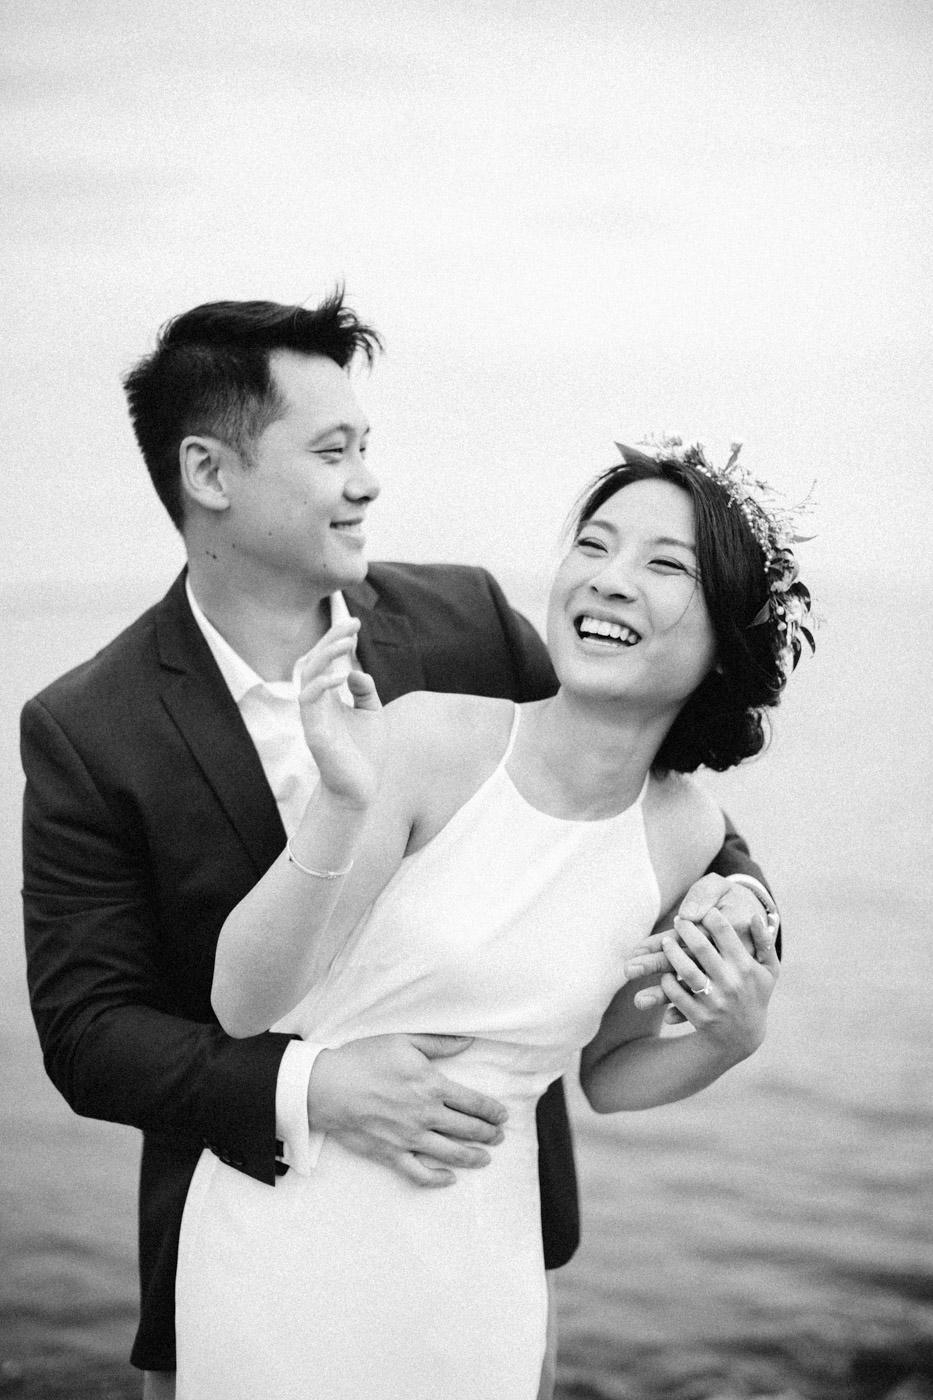 toronto_wedding_photographer_fine_art_documentary 2017-177.jpg